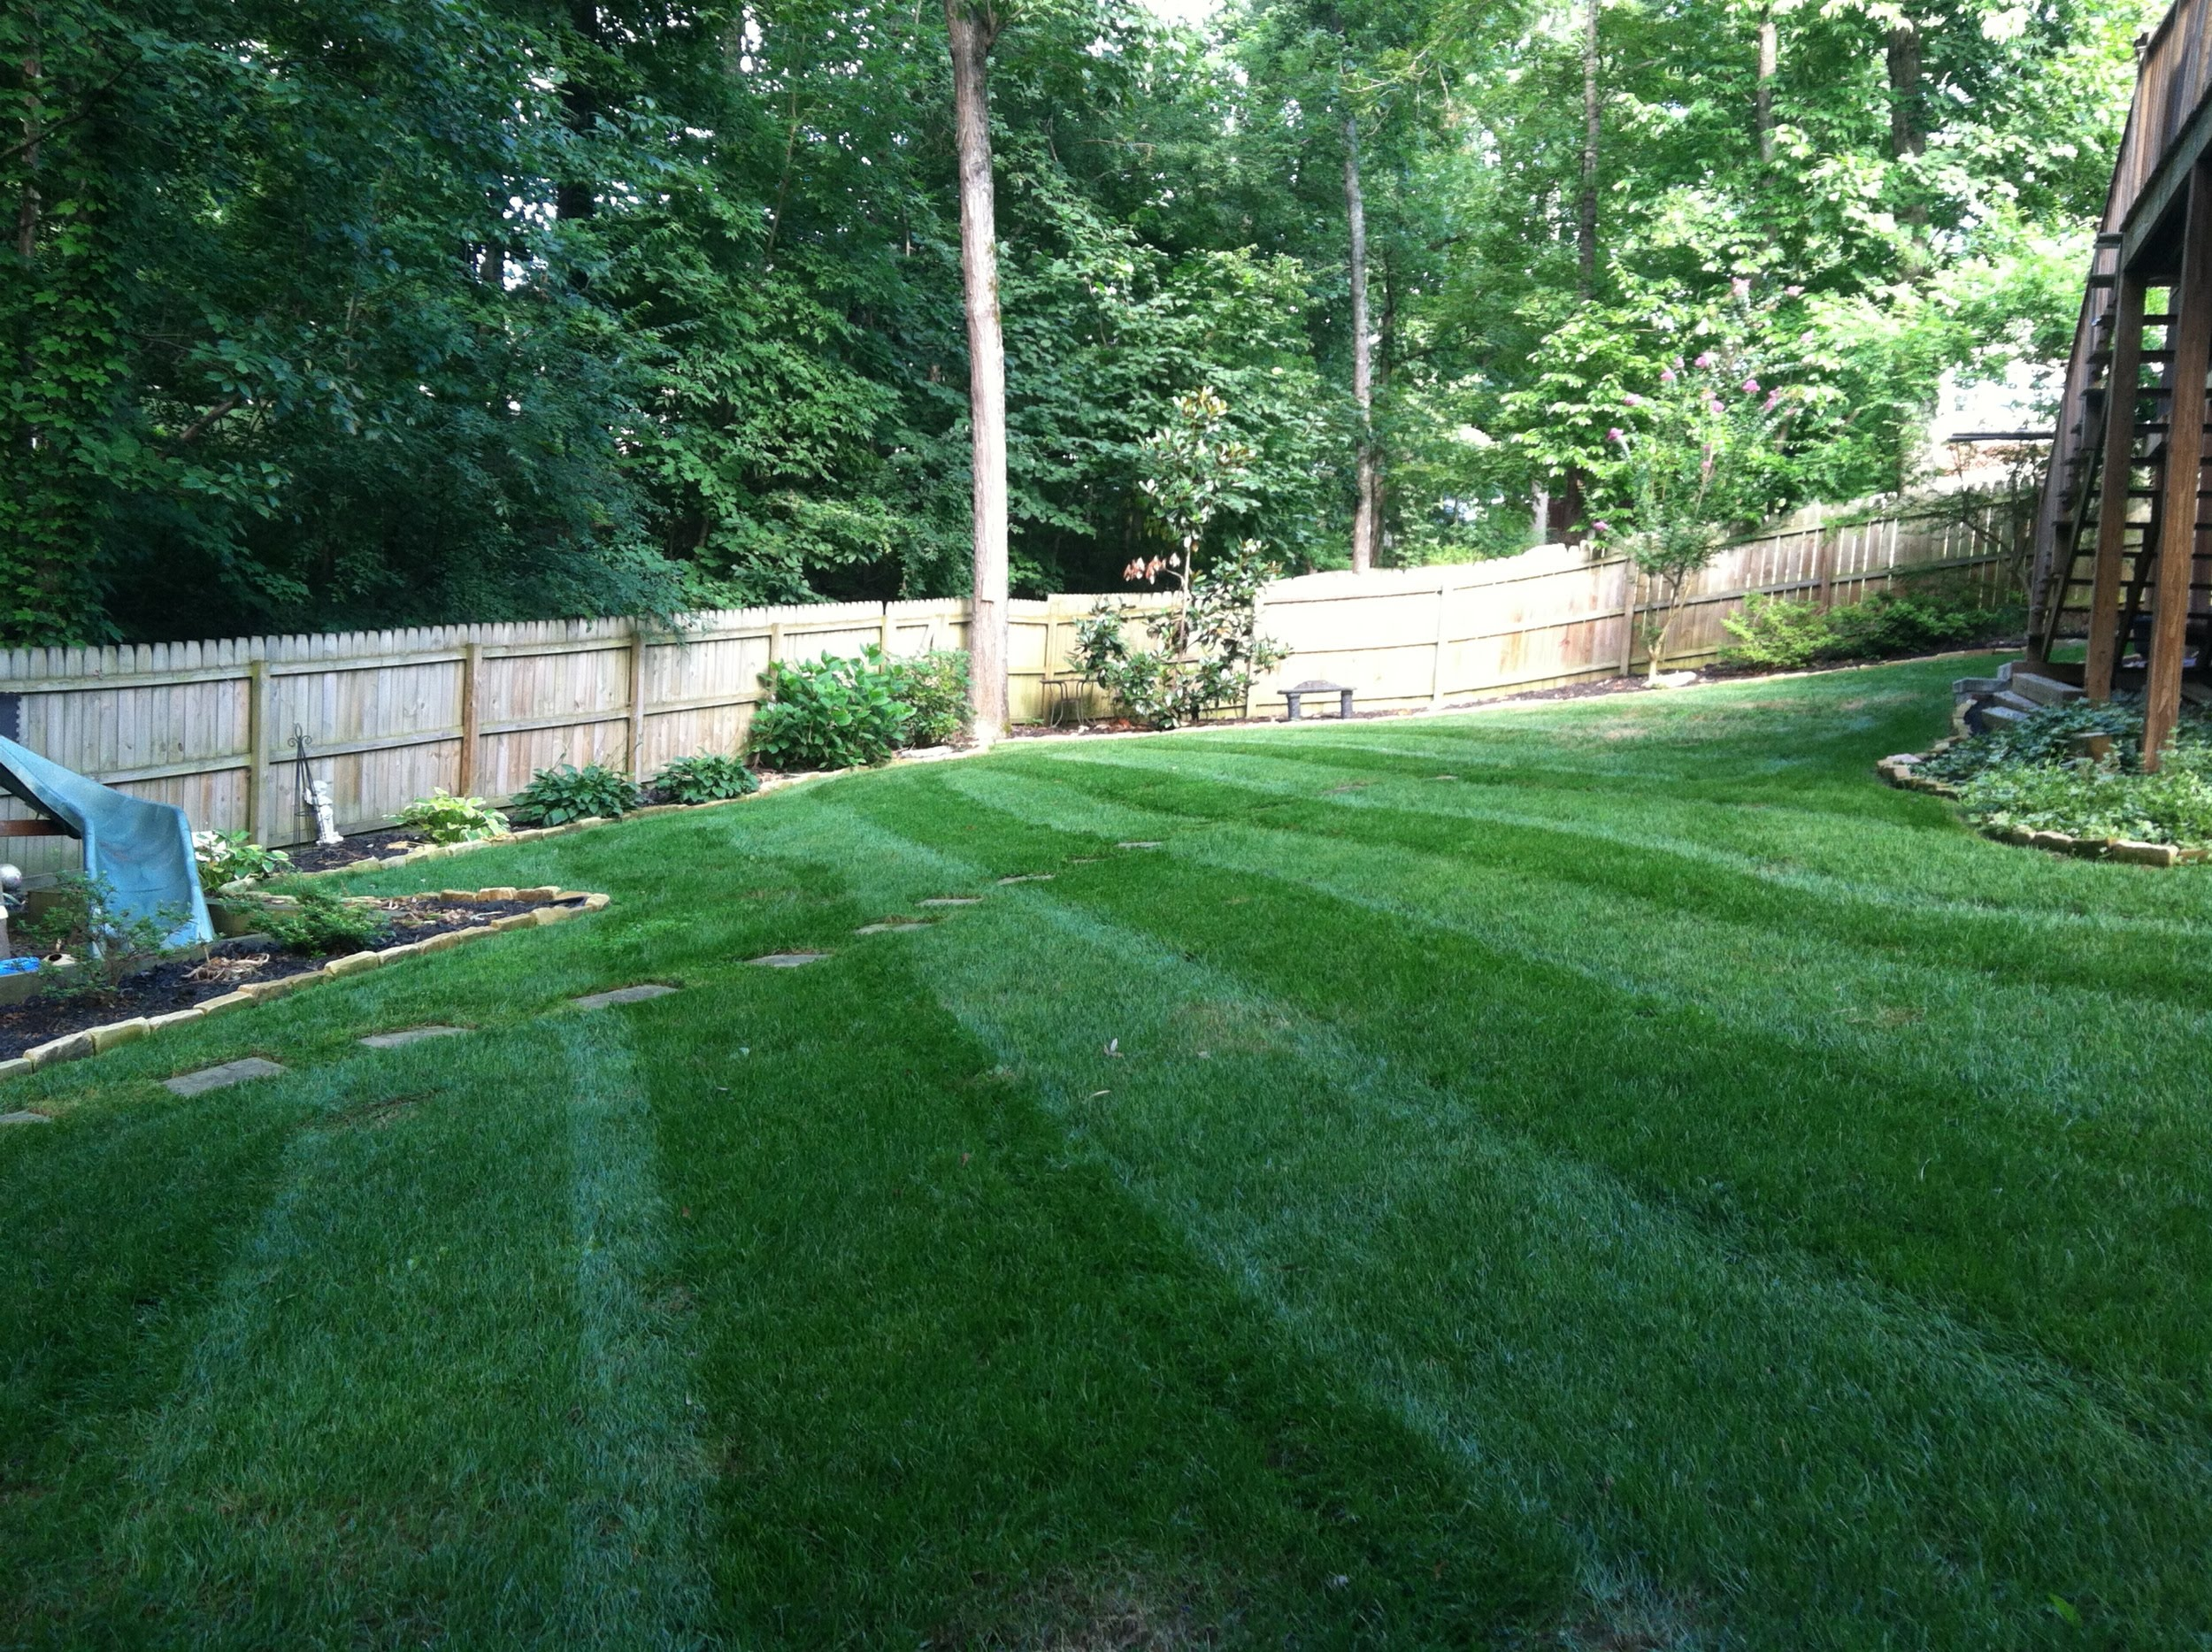 beautiful lawn care backyard by hixson landscape contractors.jpg